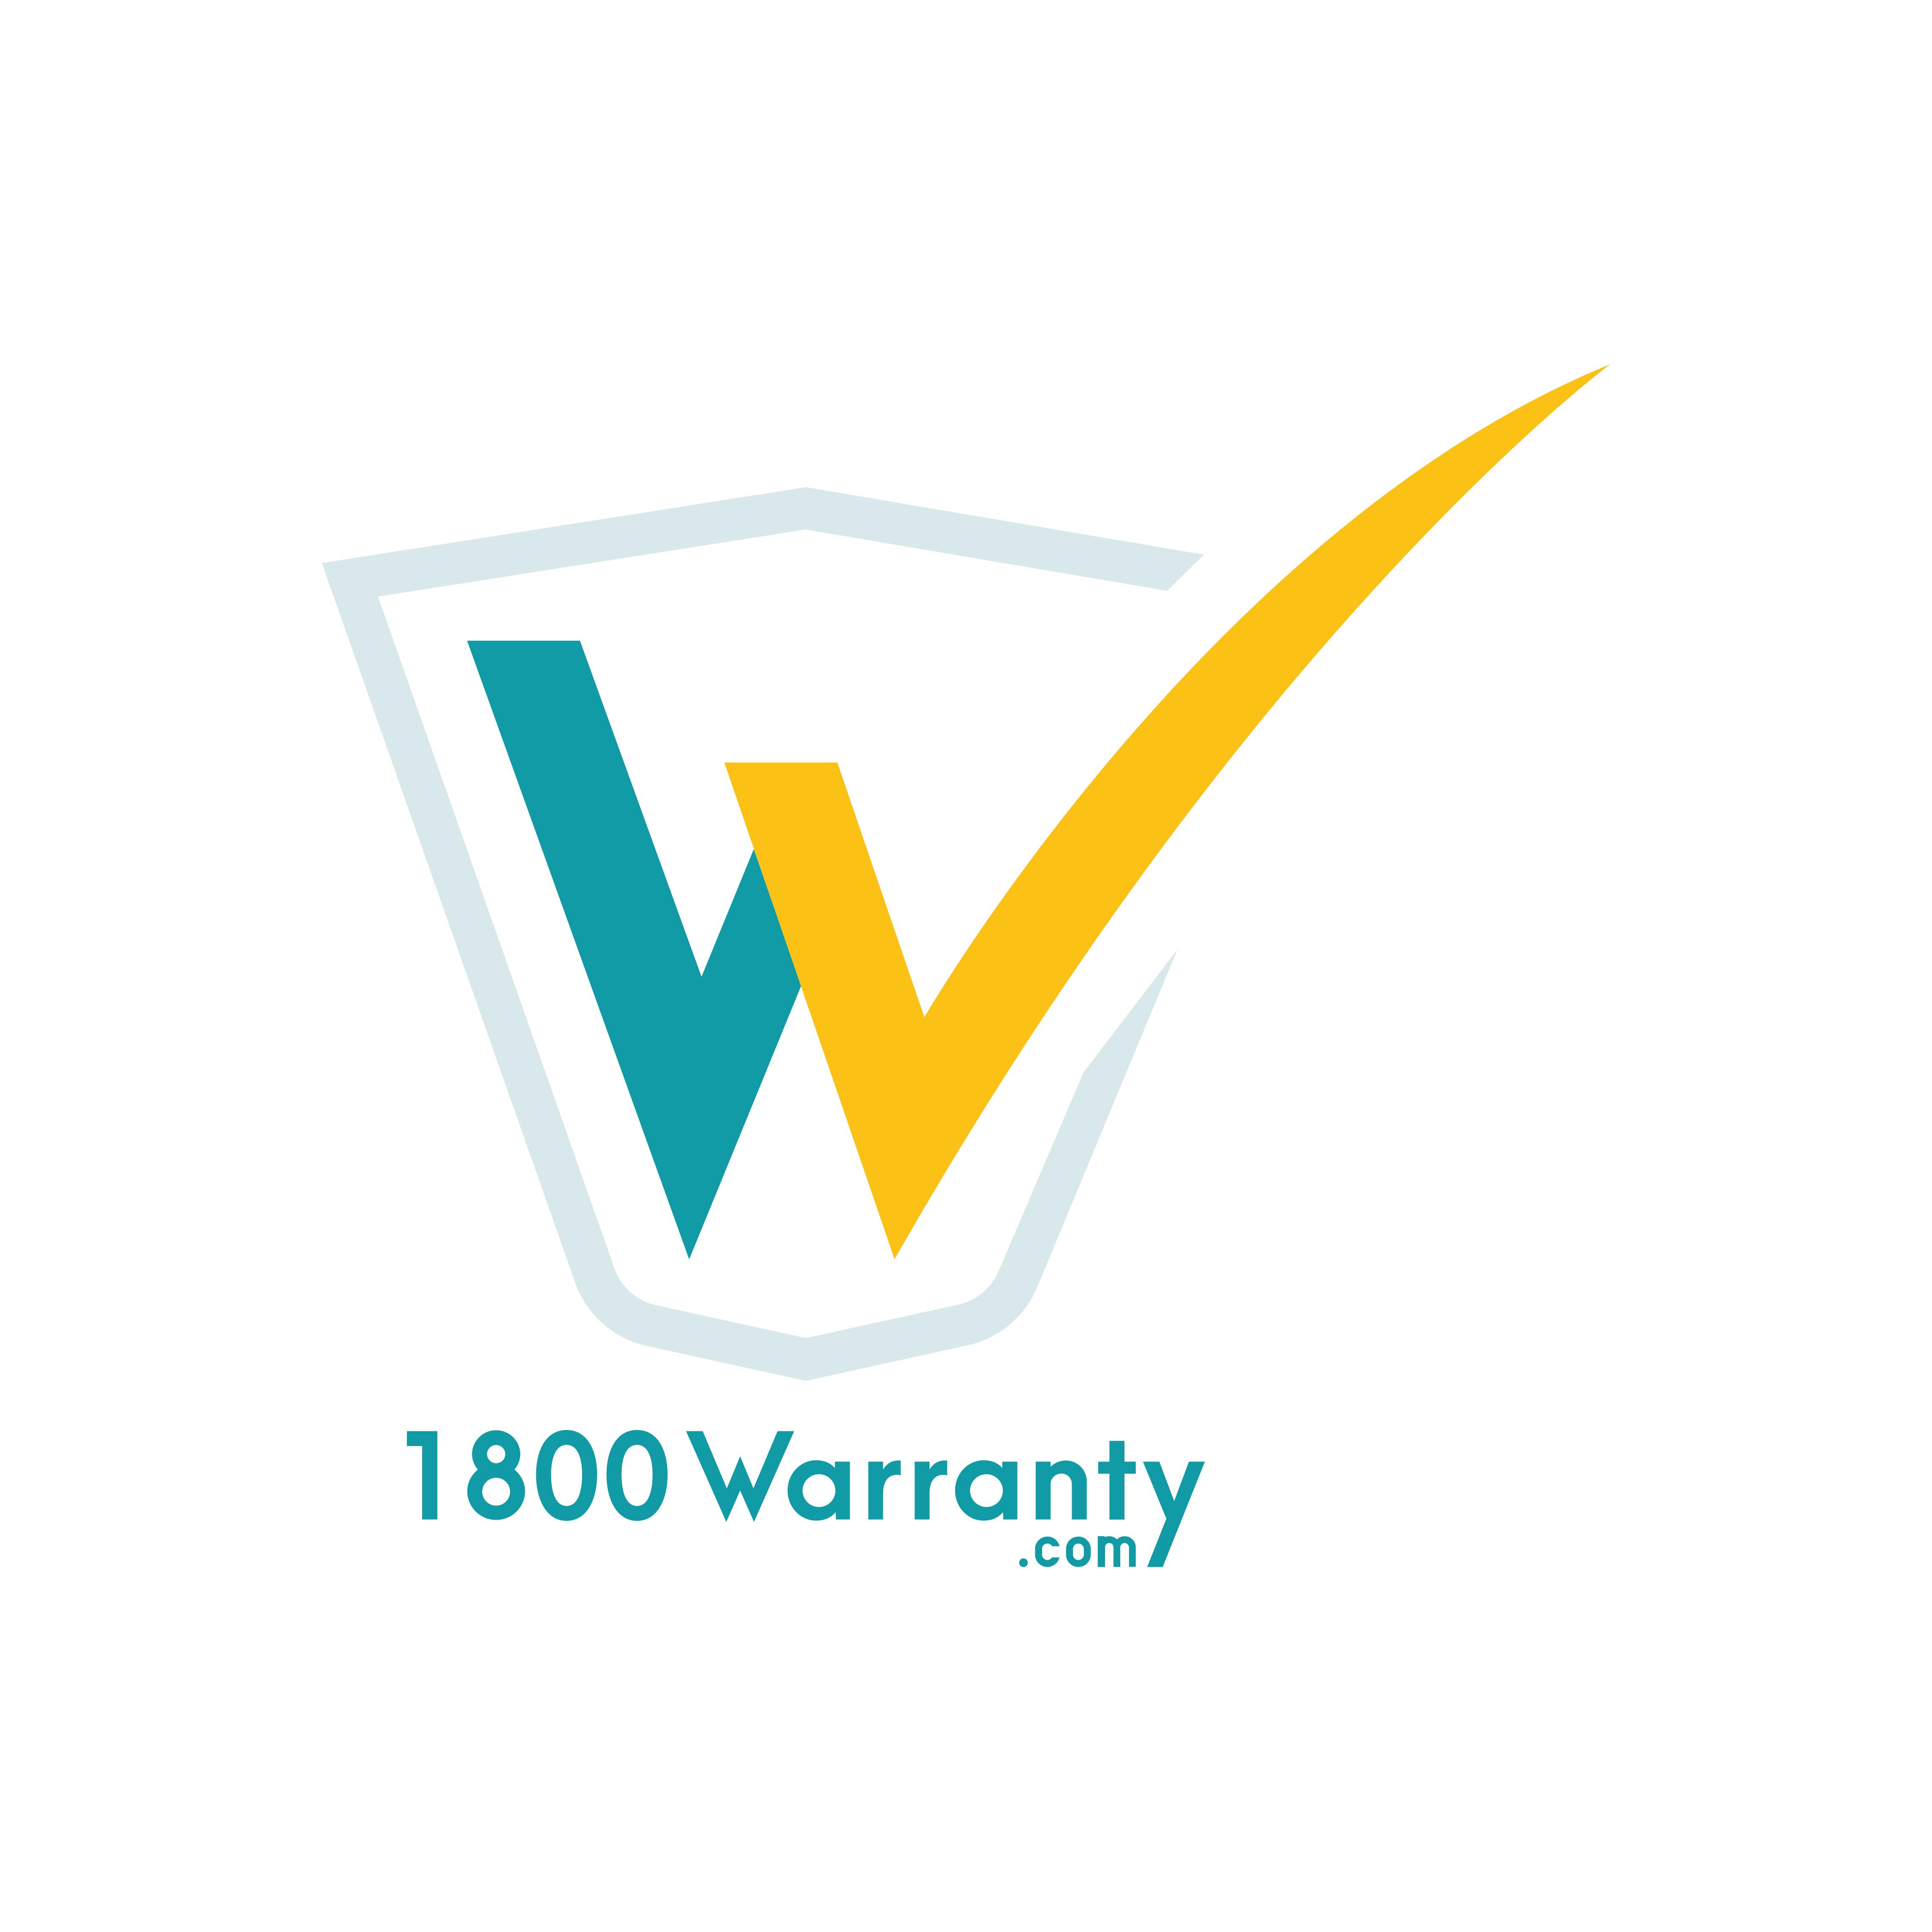 1800Warranty.com